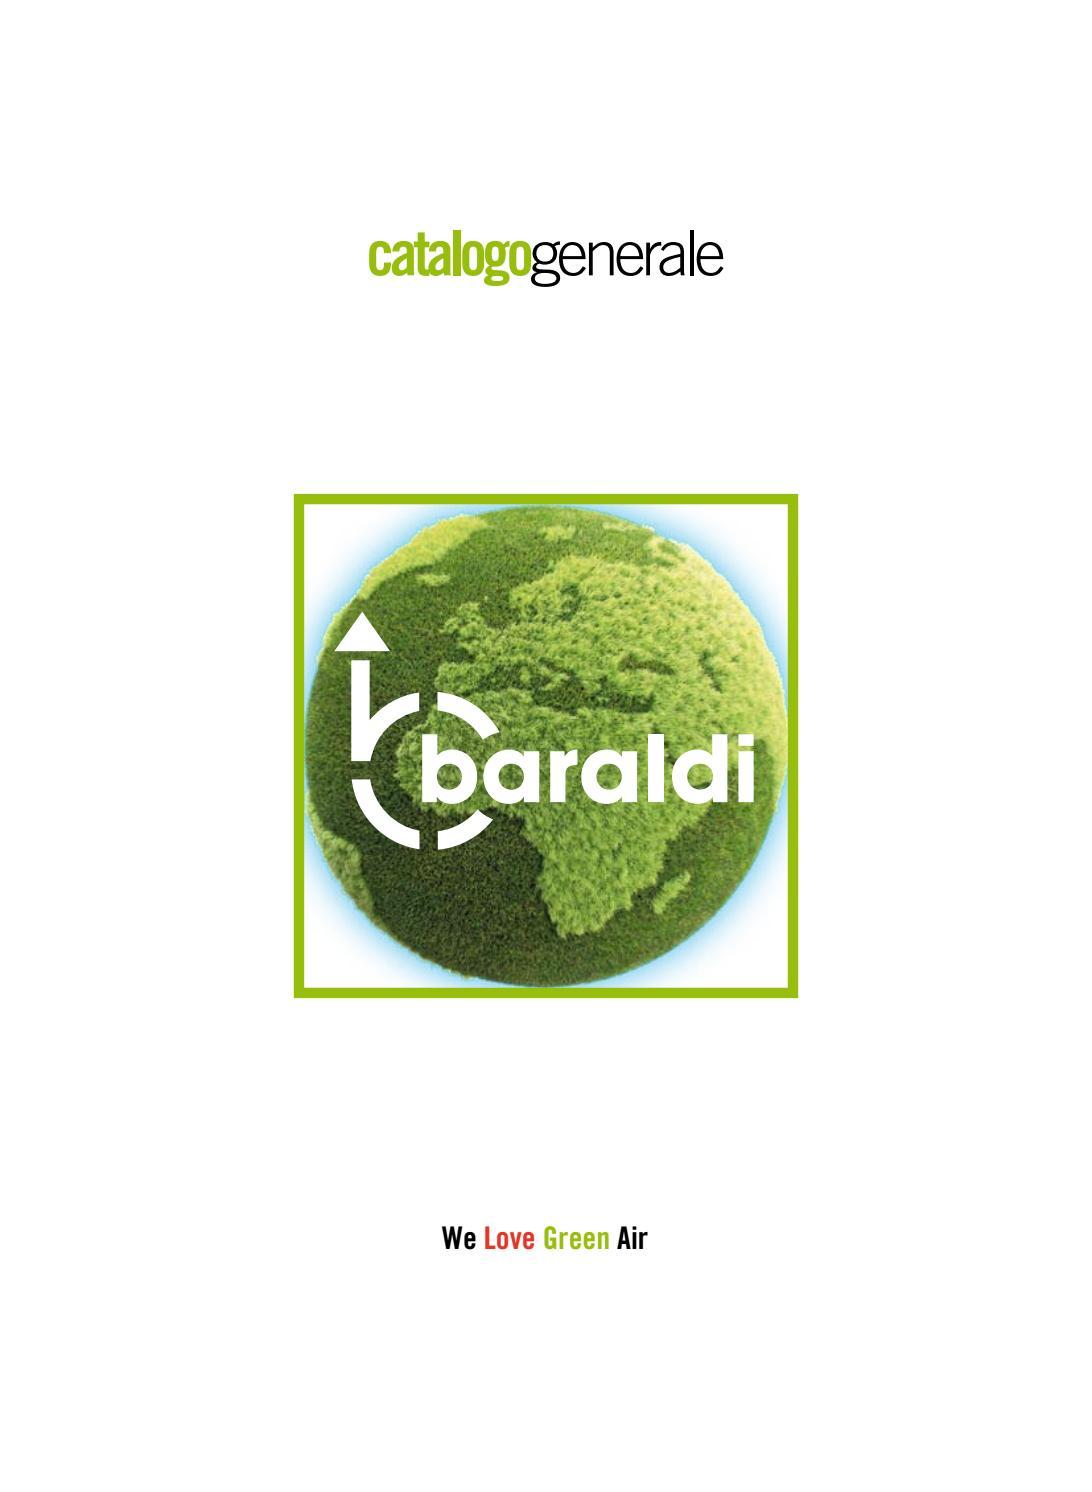 Baraldi catalogo generale 2017 by Cappe cucina Cooker Hoods - issuu 059a9ea3c65c